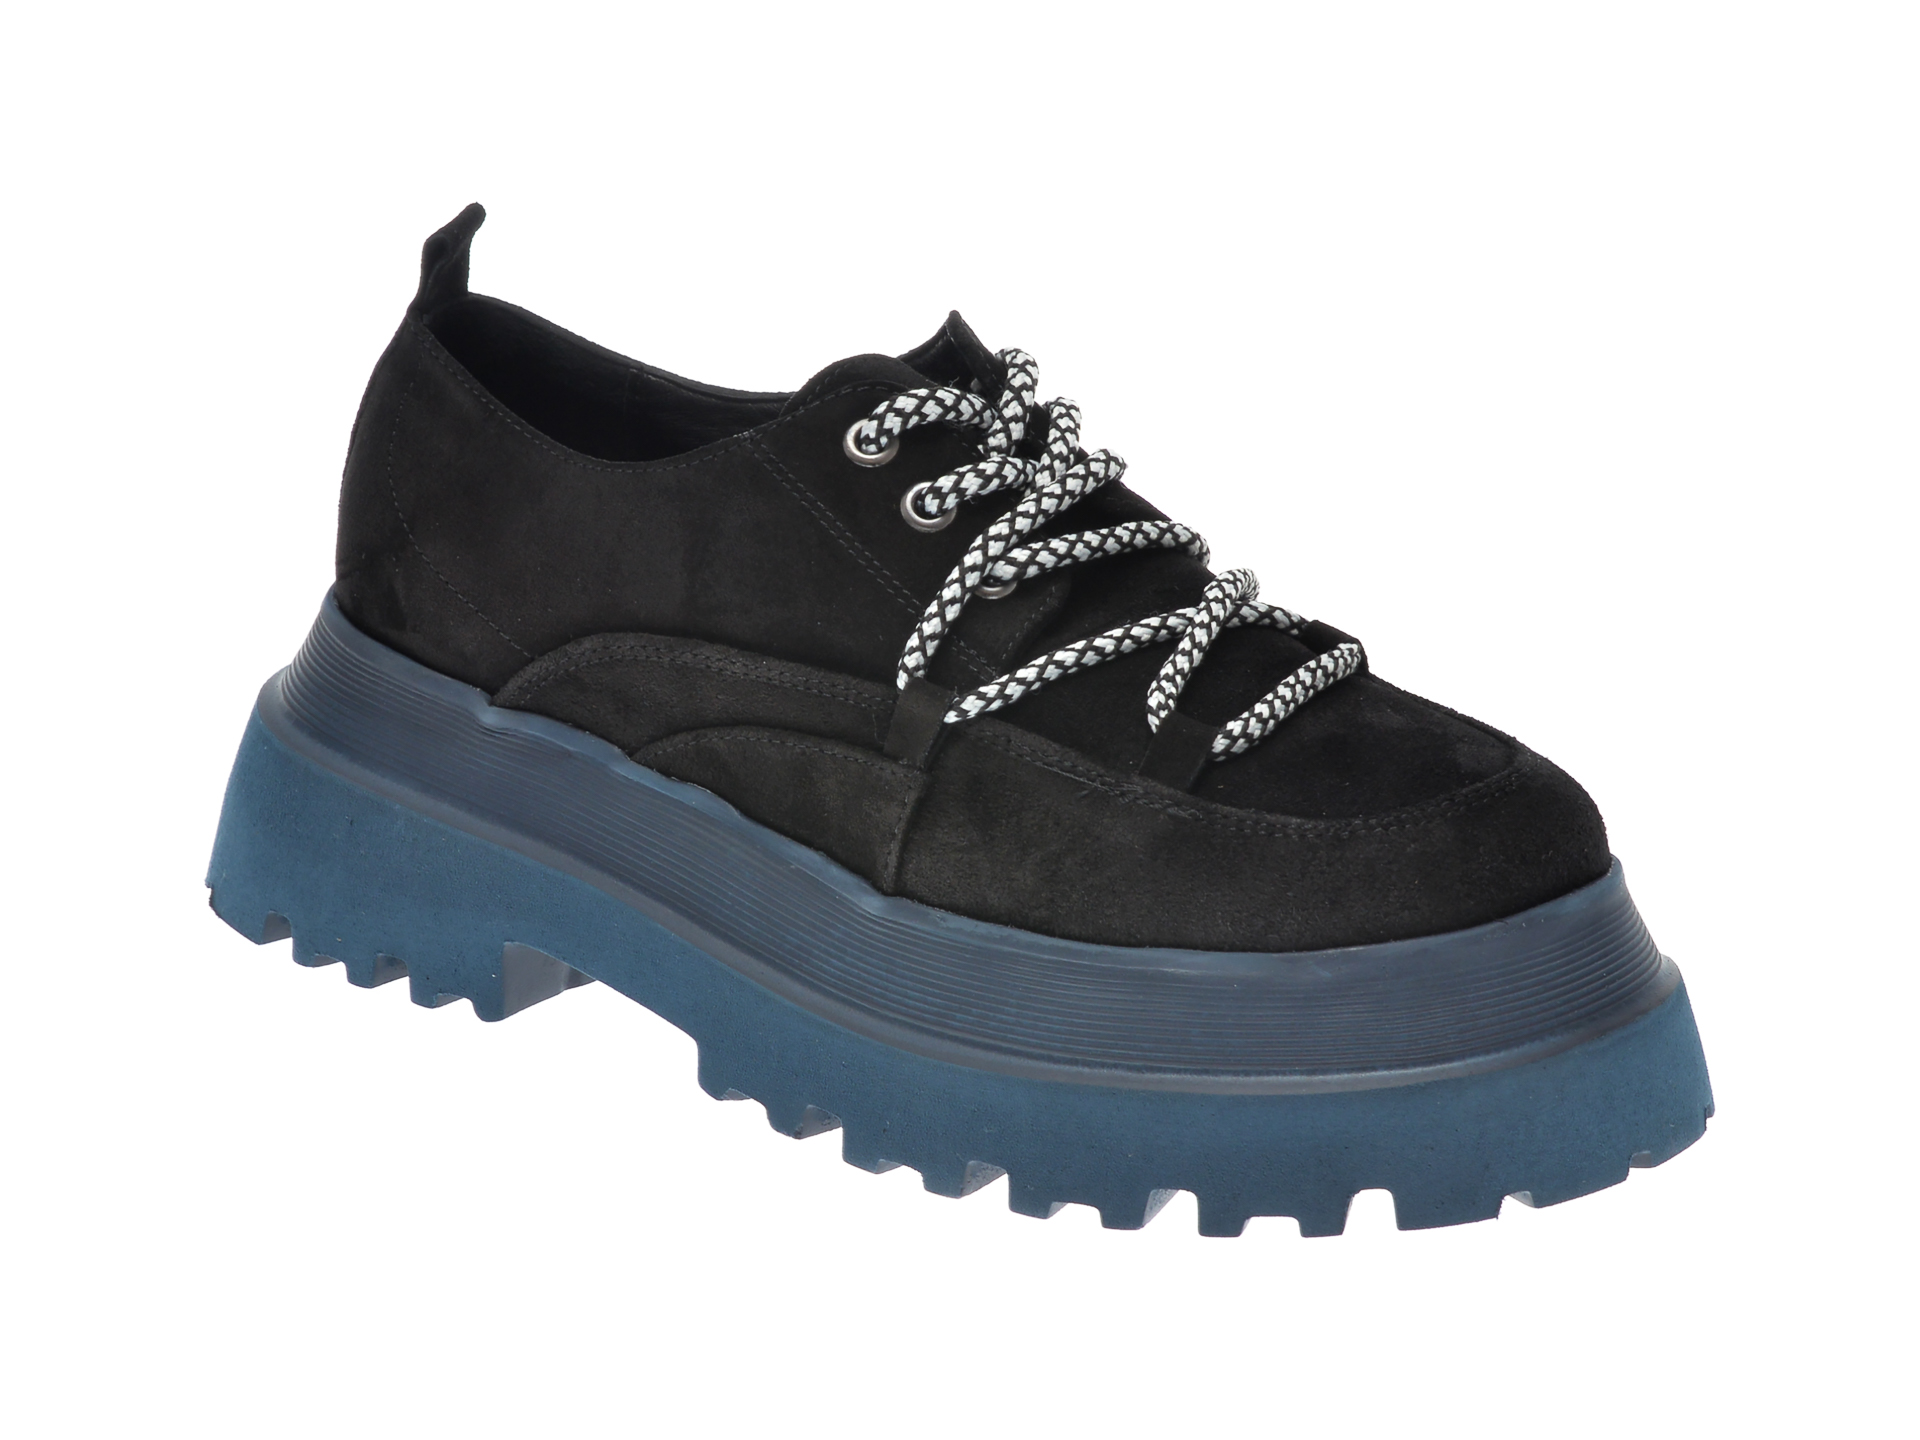 Pantofi Flavia Passini Negri, 11903, Din Piele Intoarsa